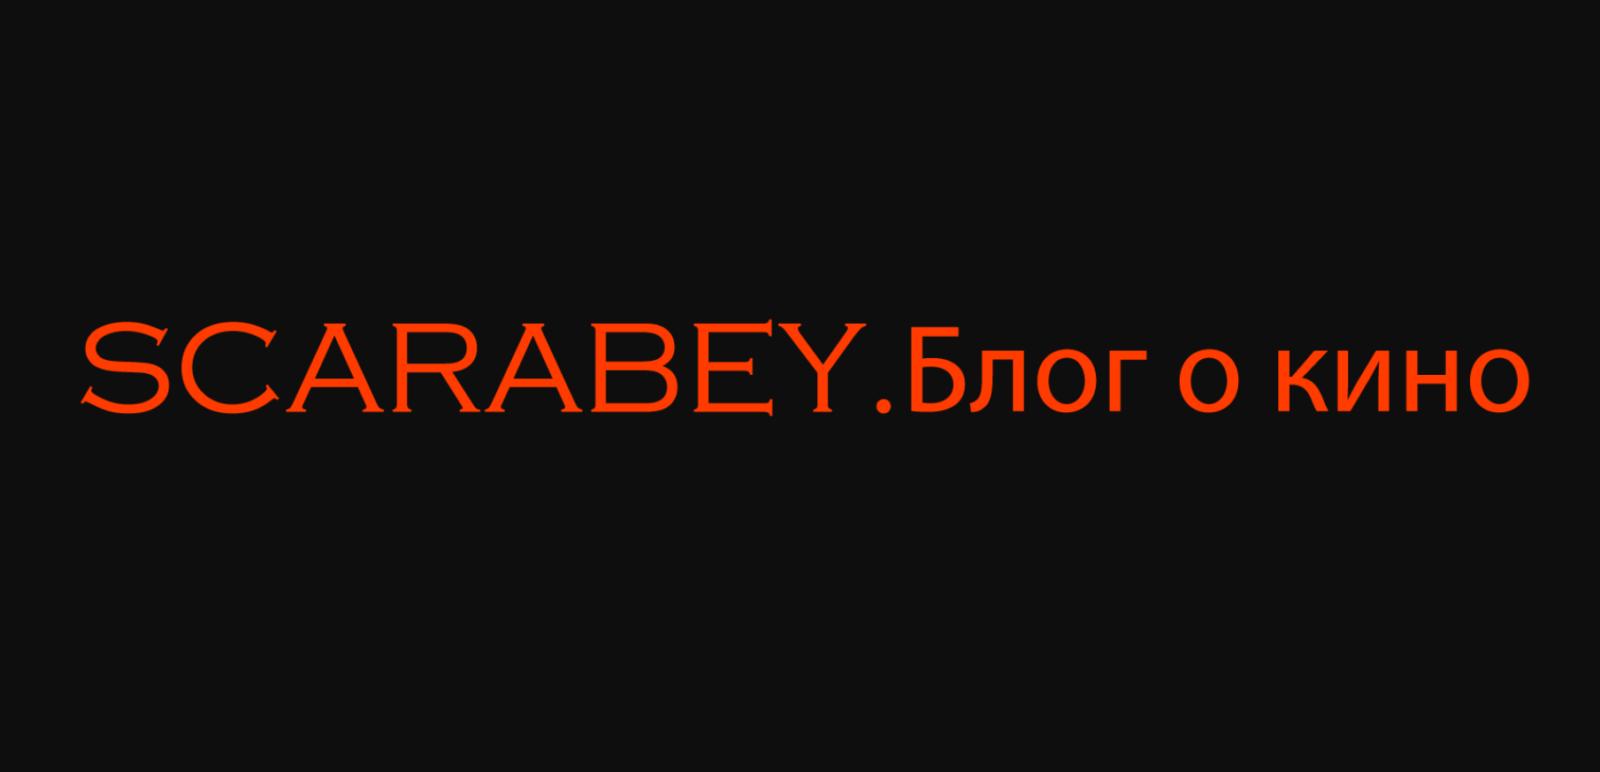 Приветствую вас на новом блоге Scarabey.